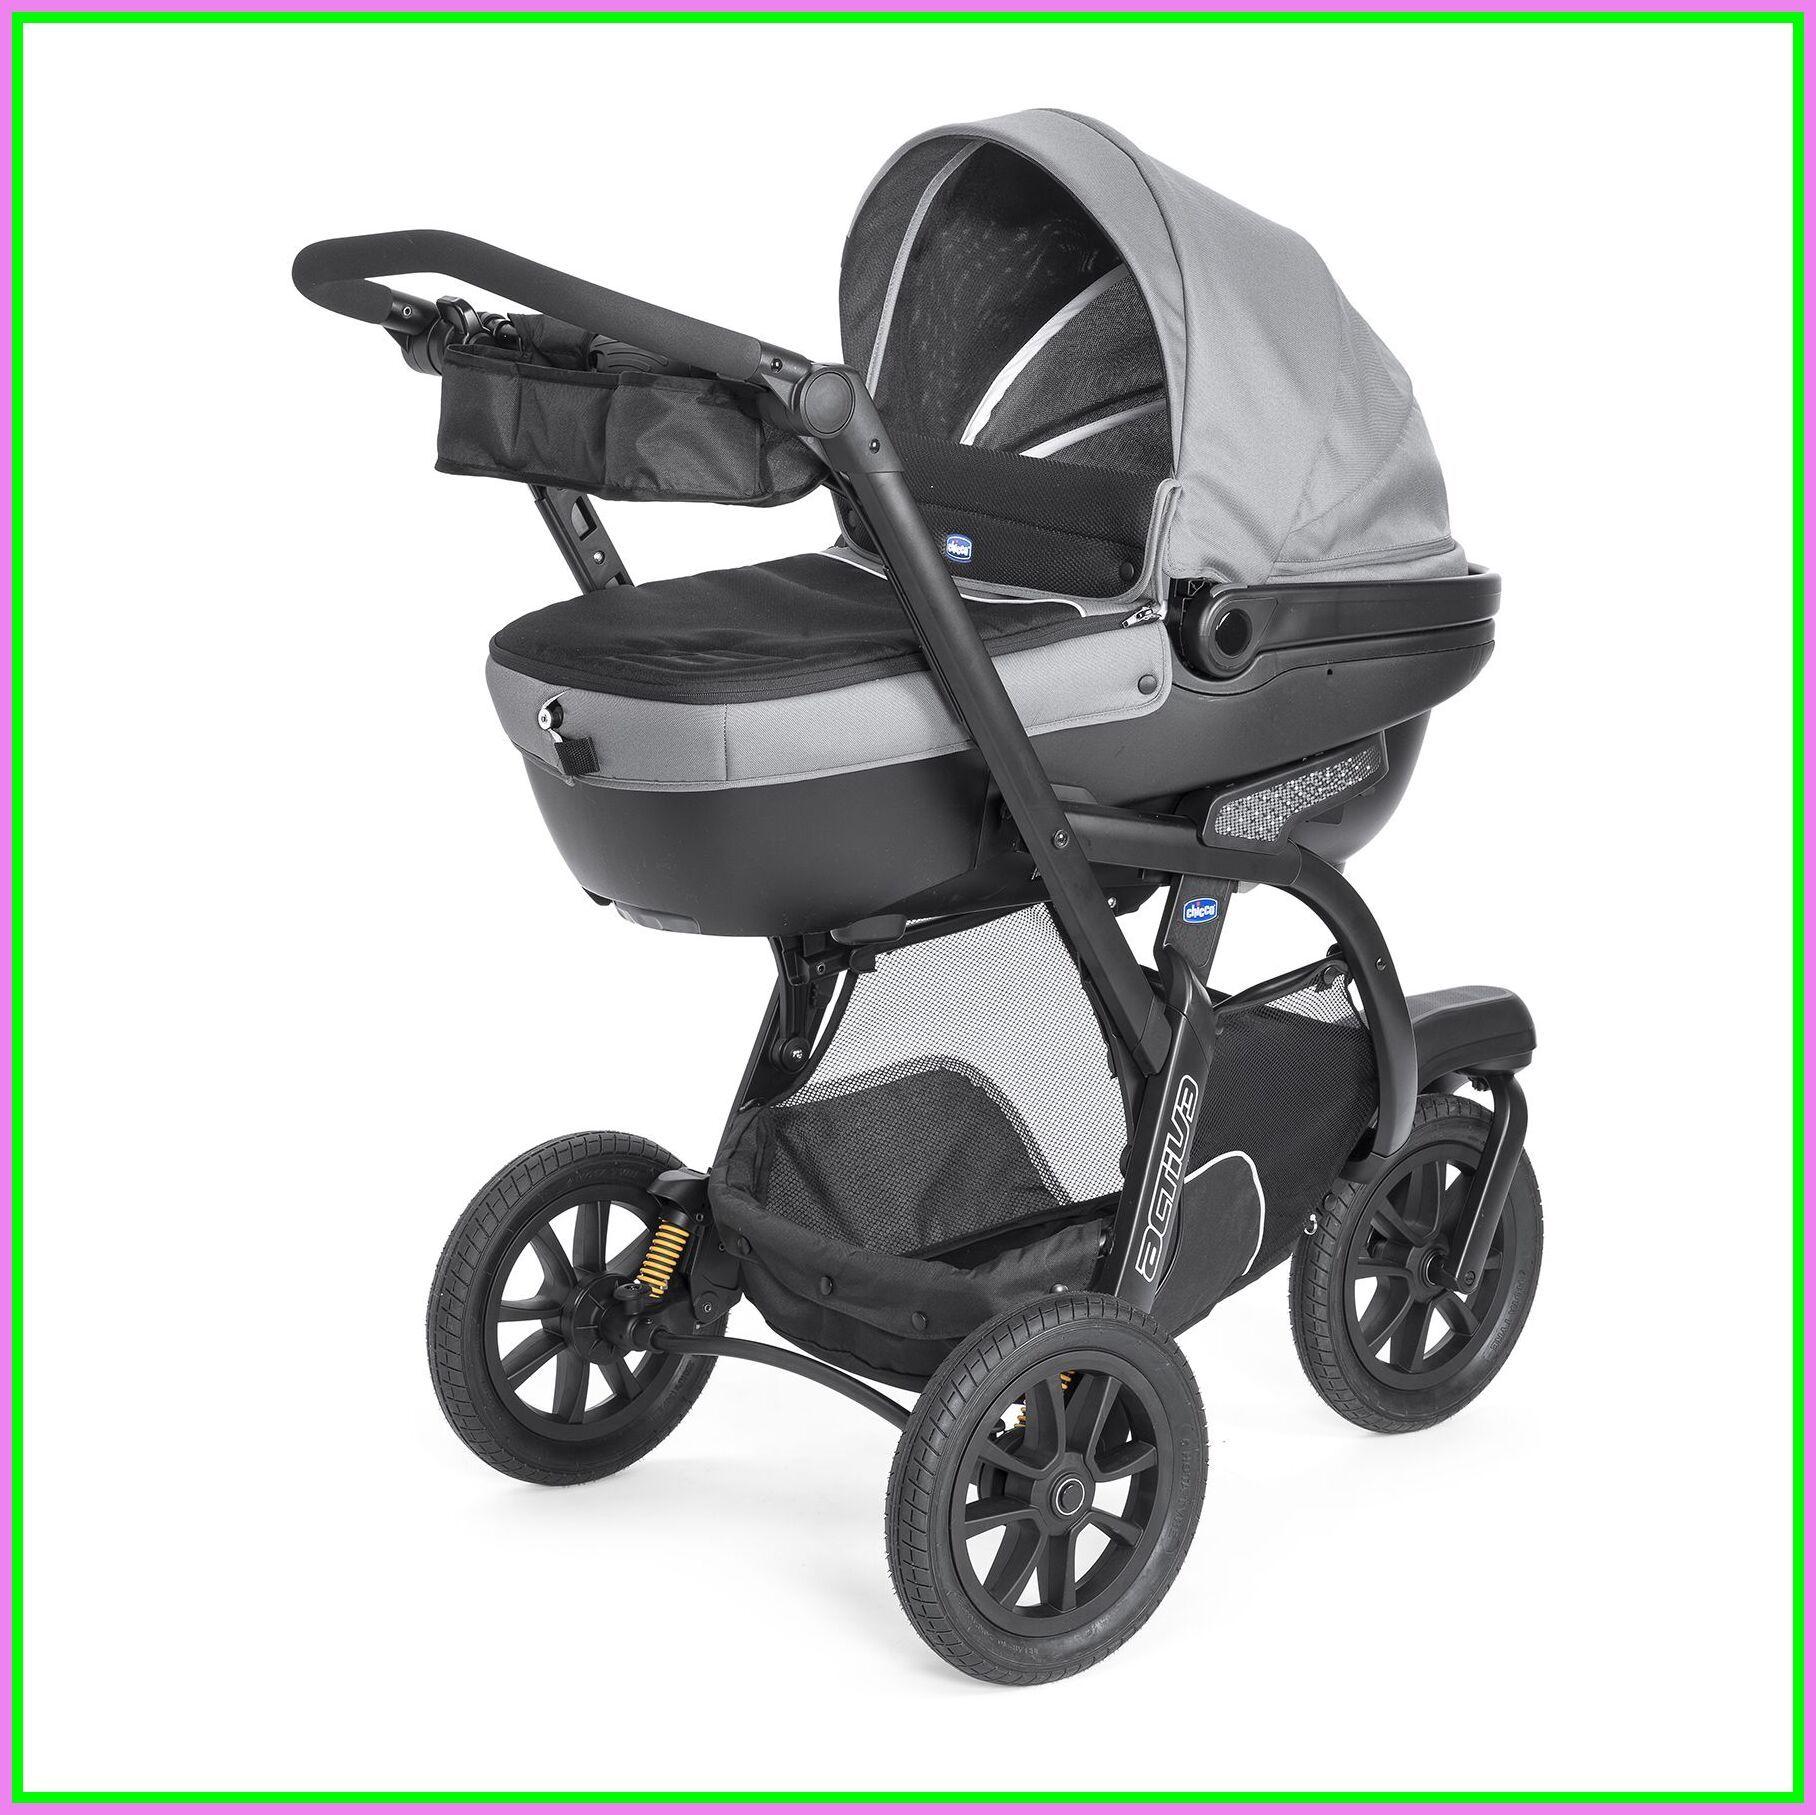 chicco stroller greychicco stroller grey Please Click